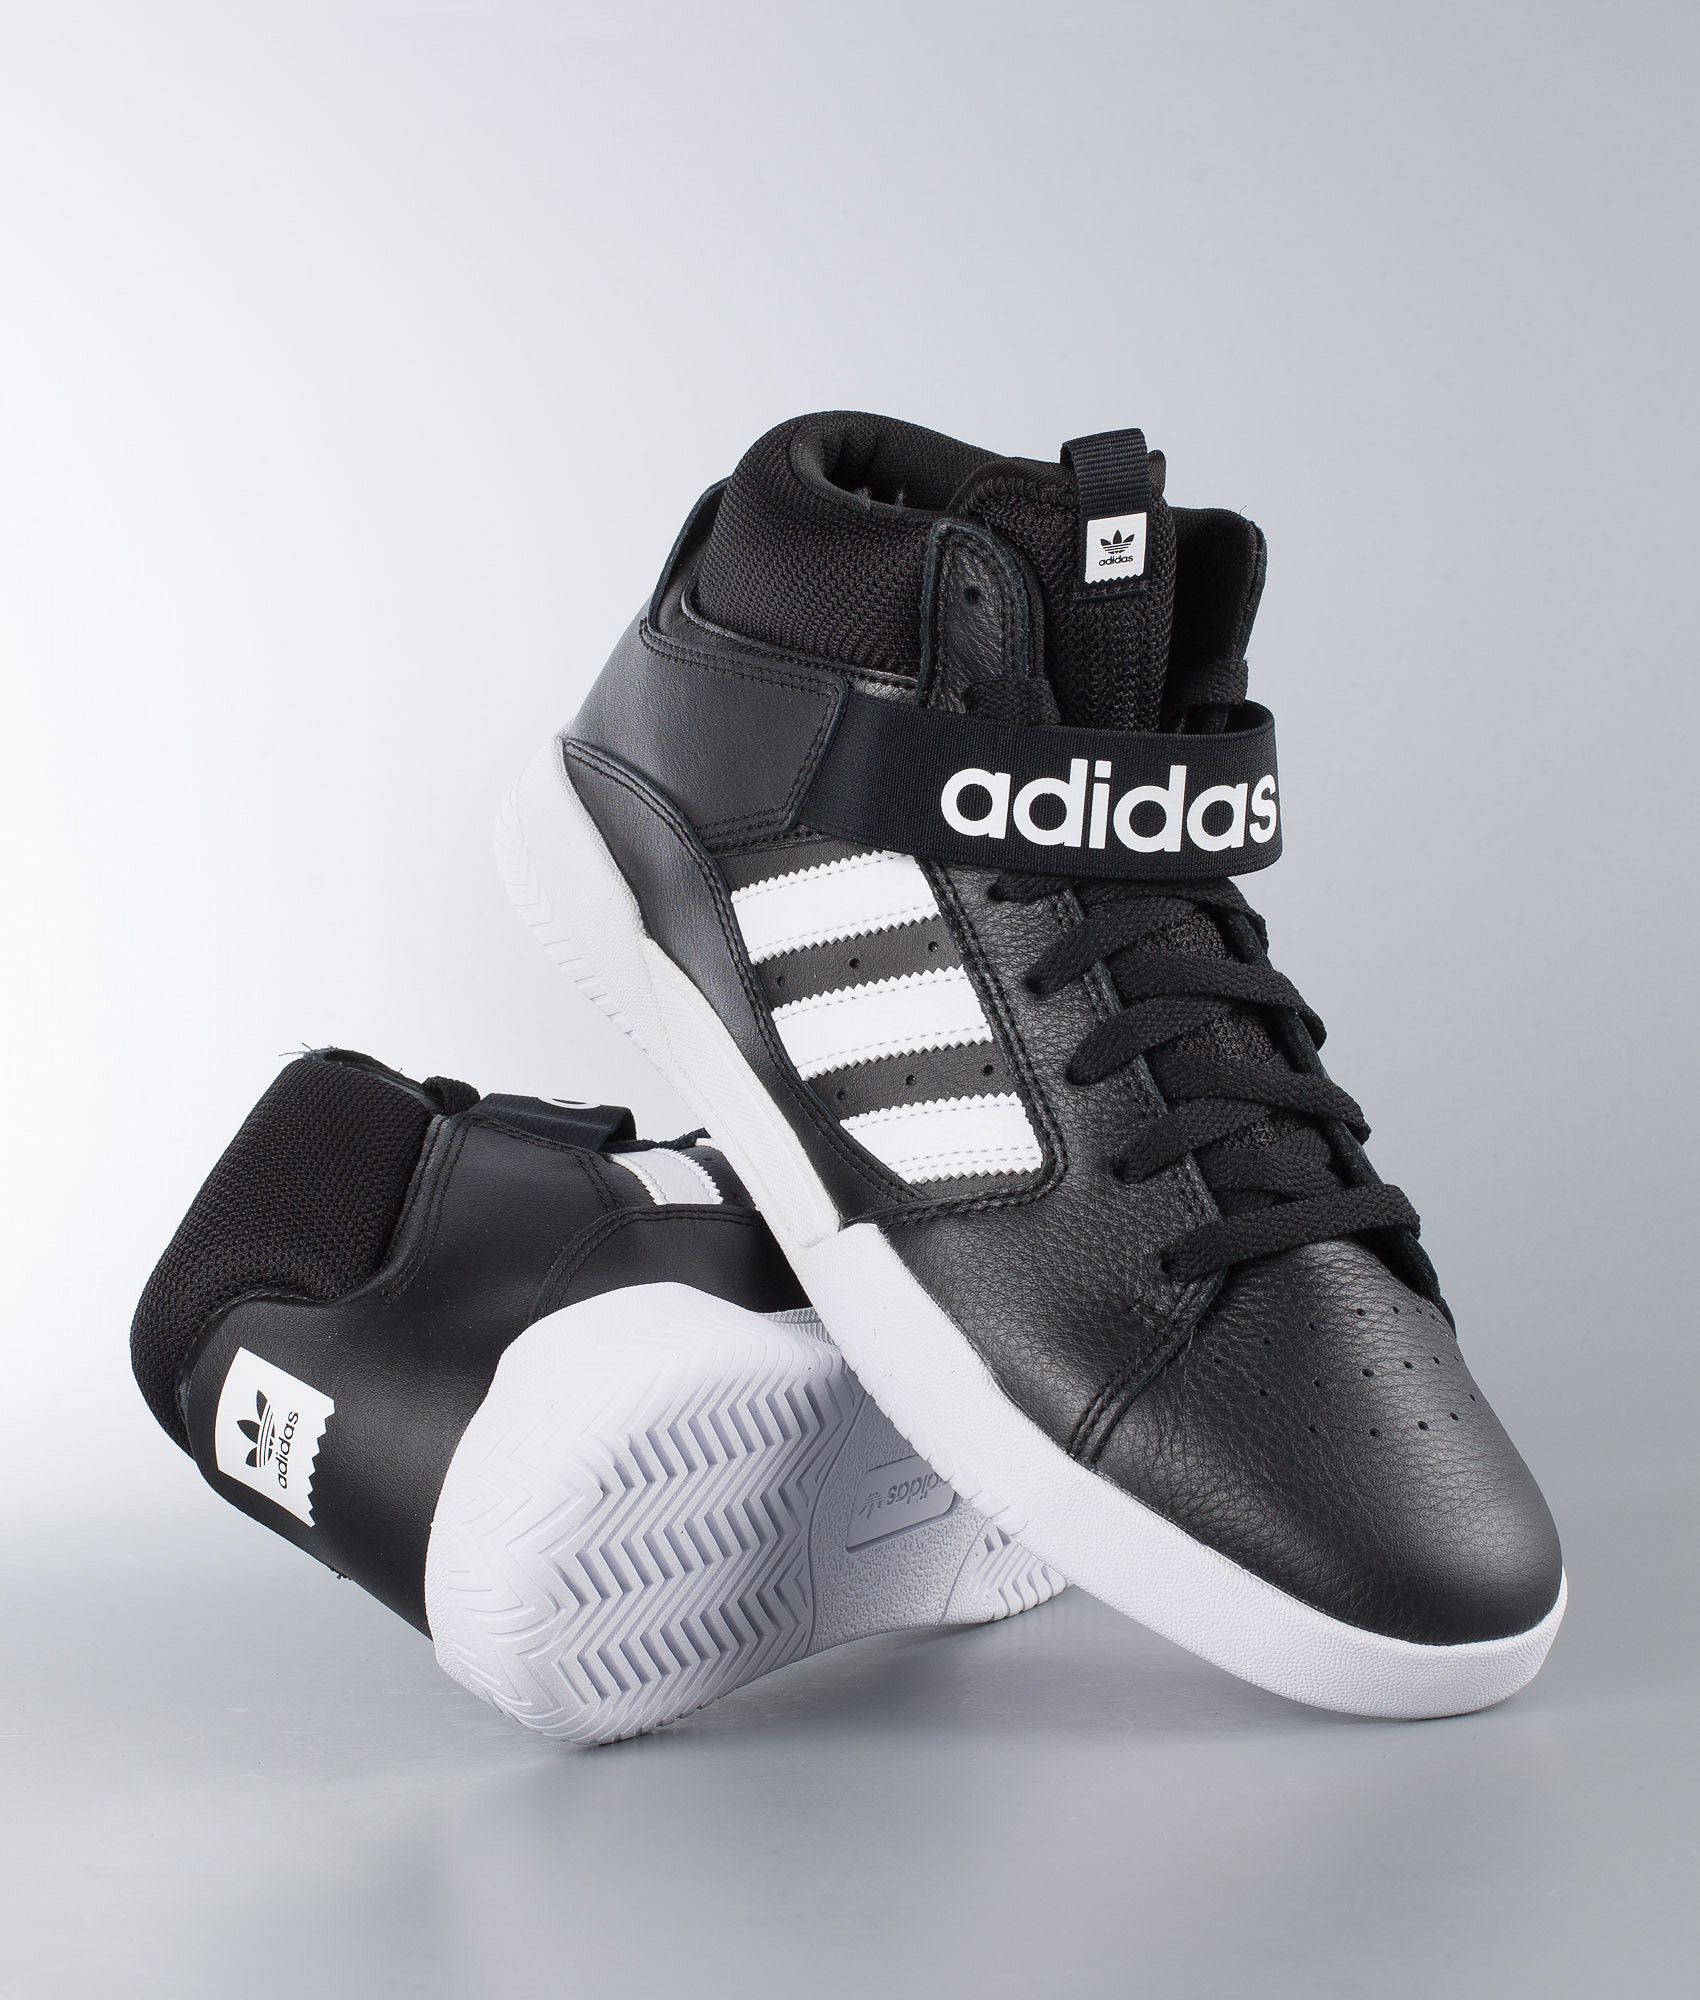 55f2f671e4ee Adidas Skateboarding Vrx Mid Shoes Black. Core Black Ftwr White Ftwr White